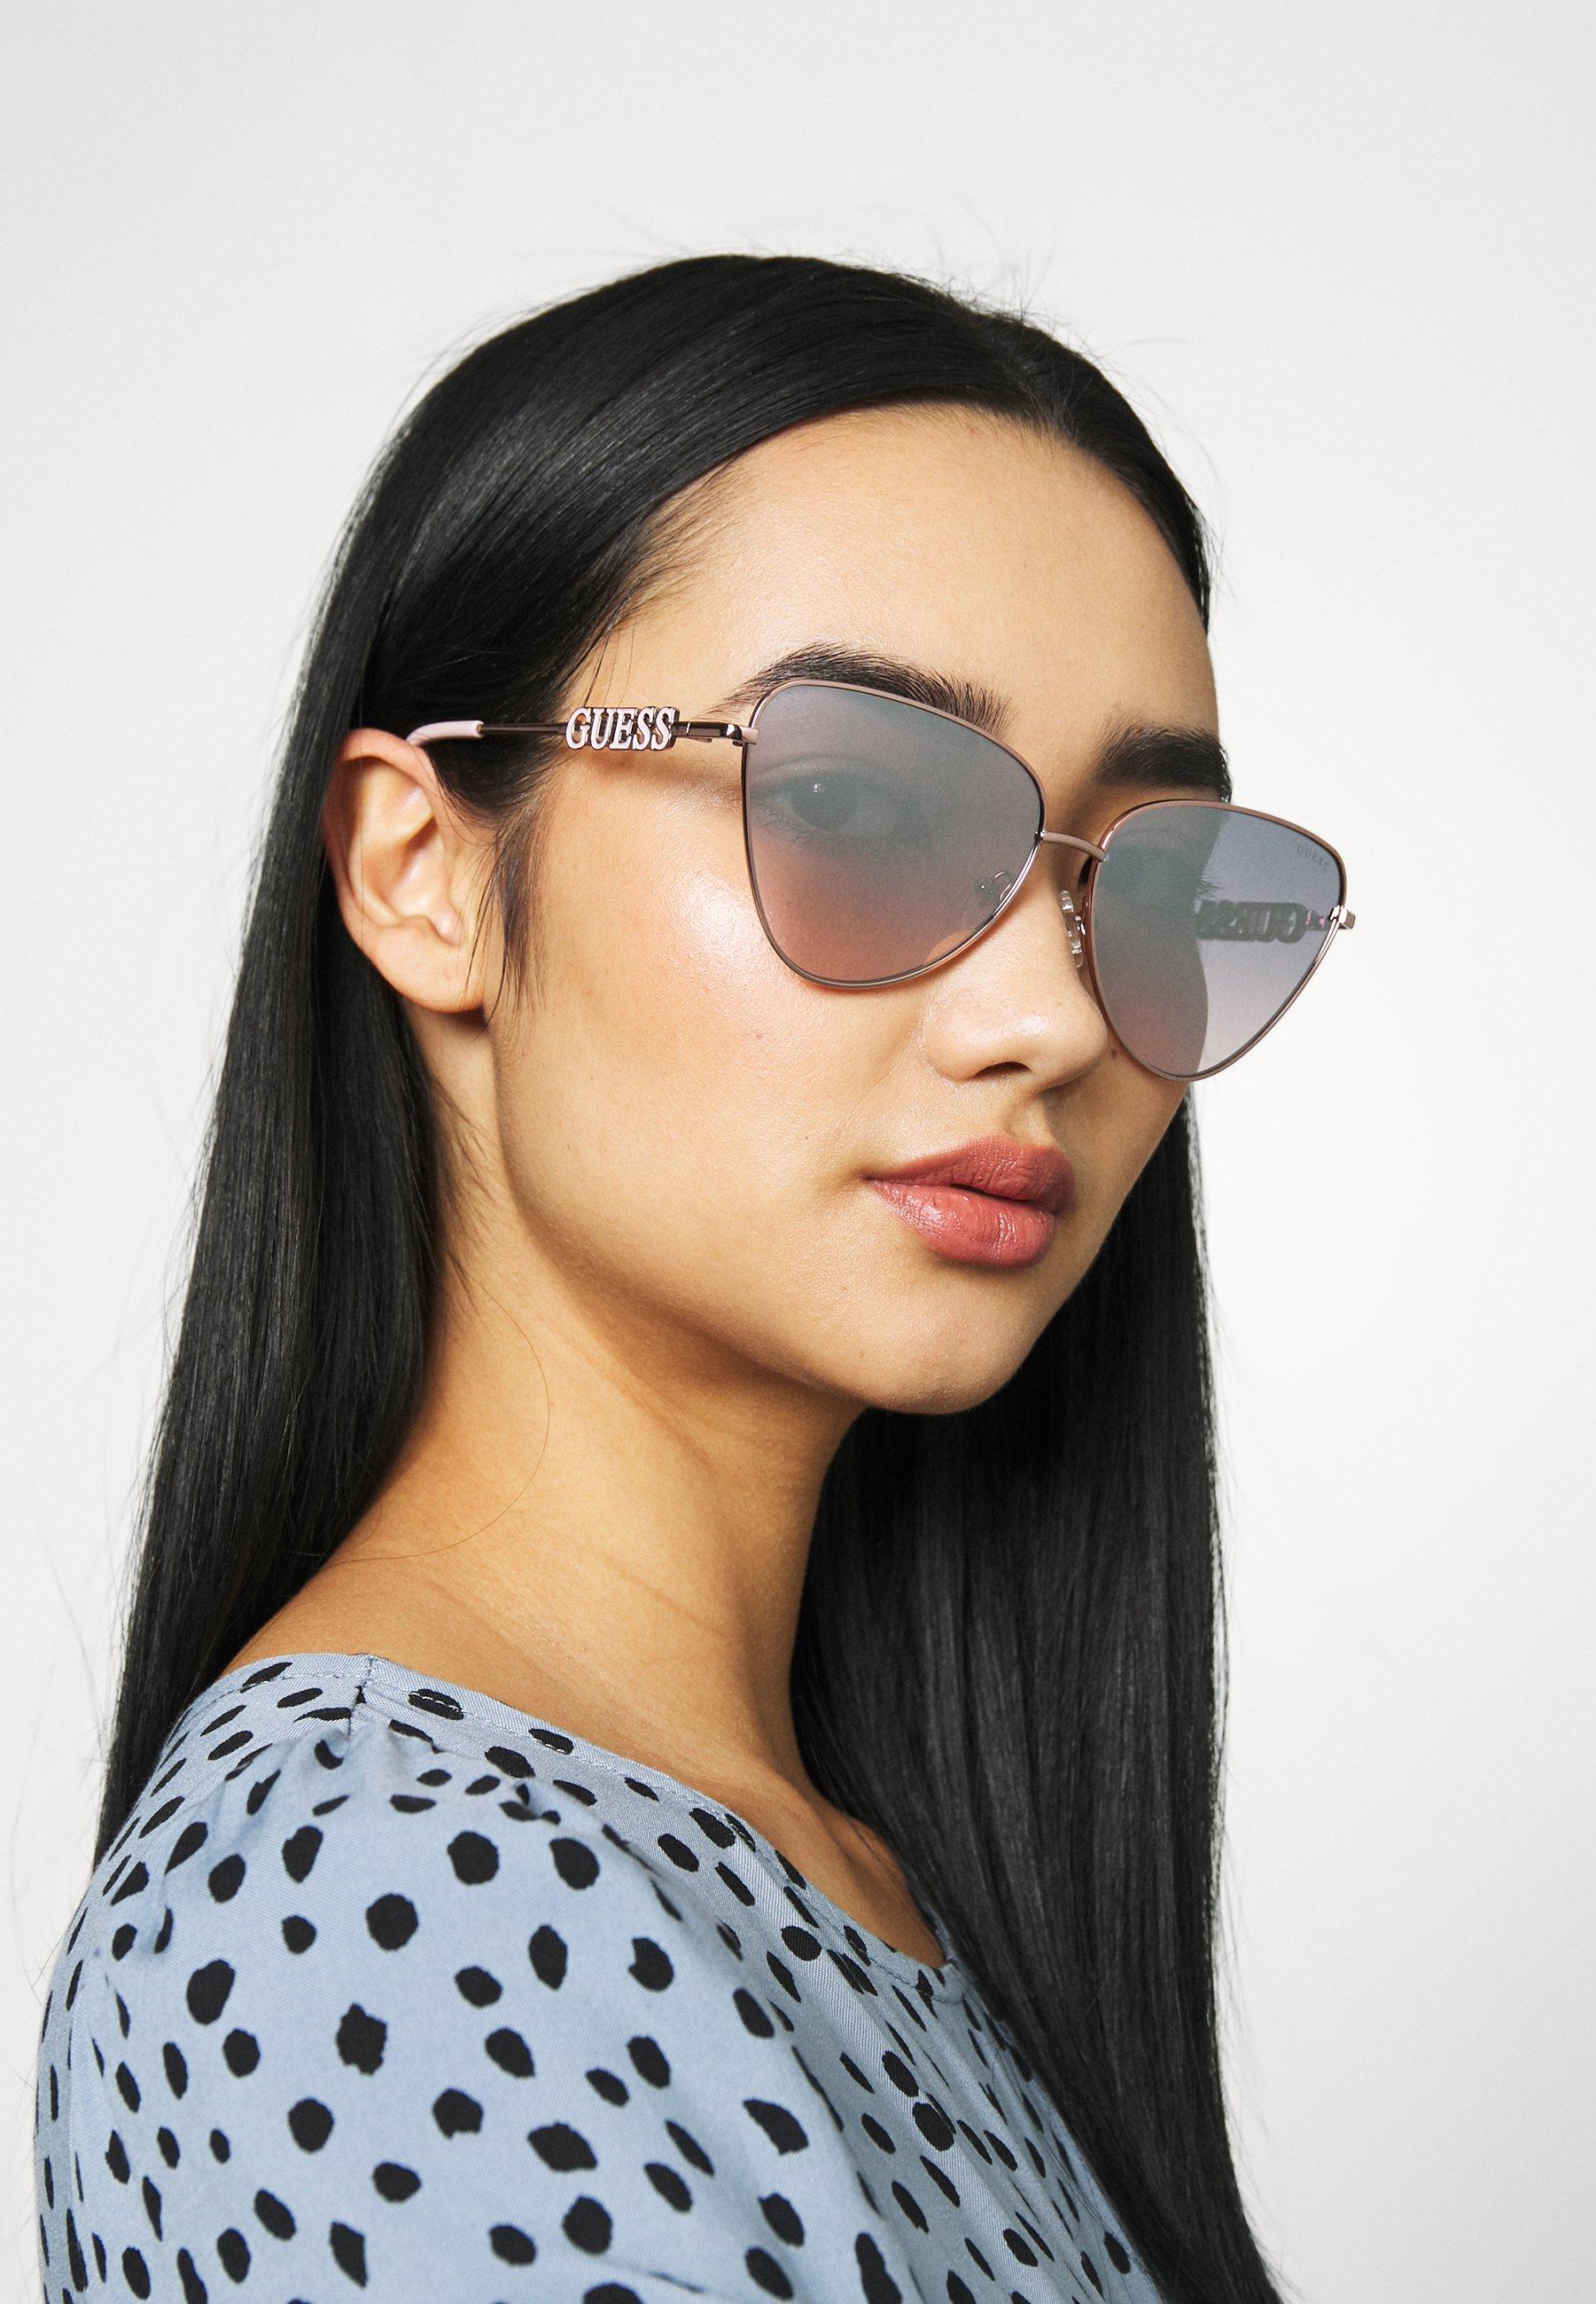 Guess Sunglasses - pink